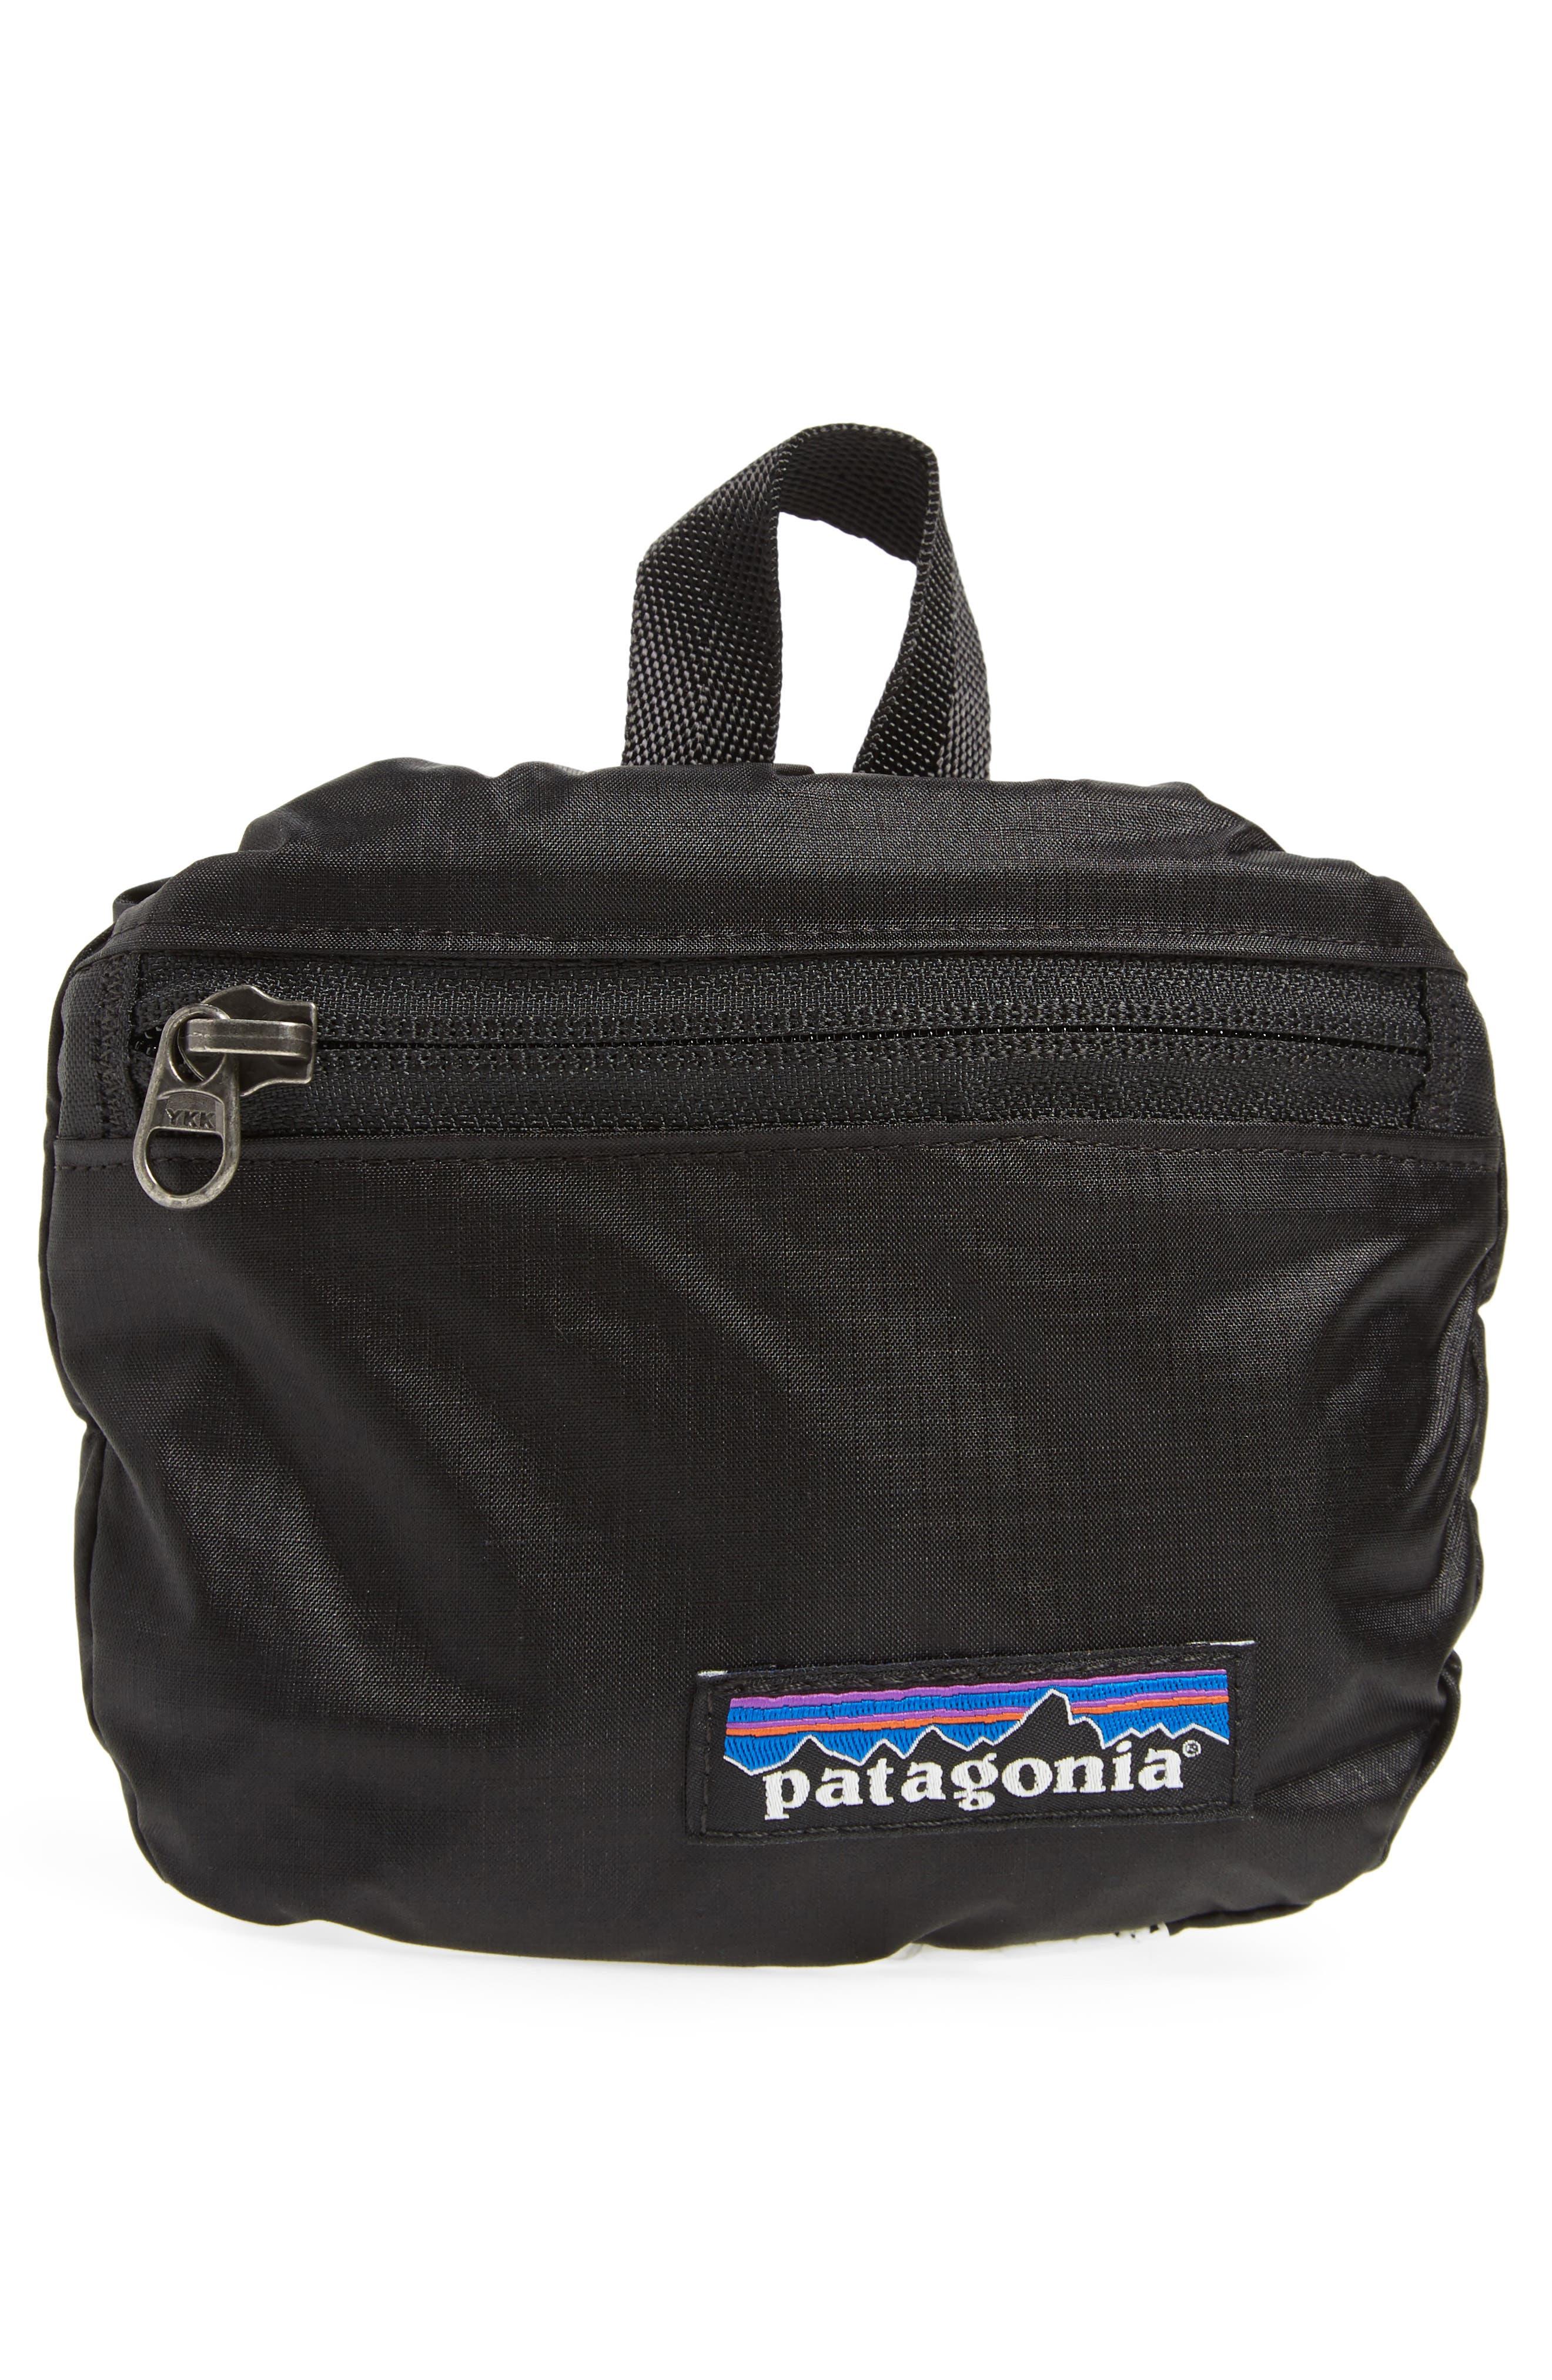 Travel Belt Bag,                             Alternate thumbnail 8, color,                             001